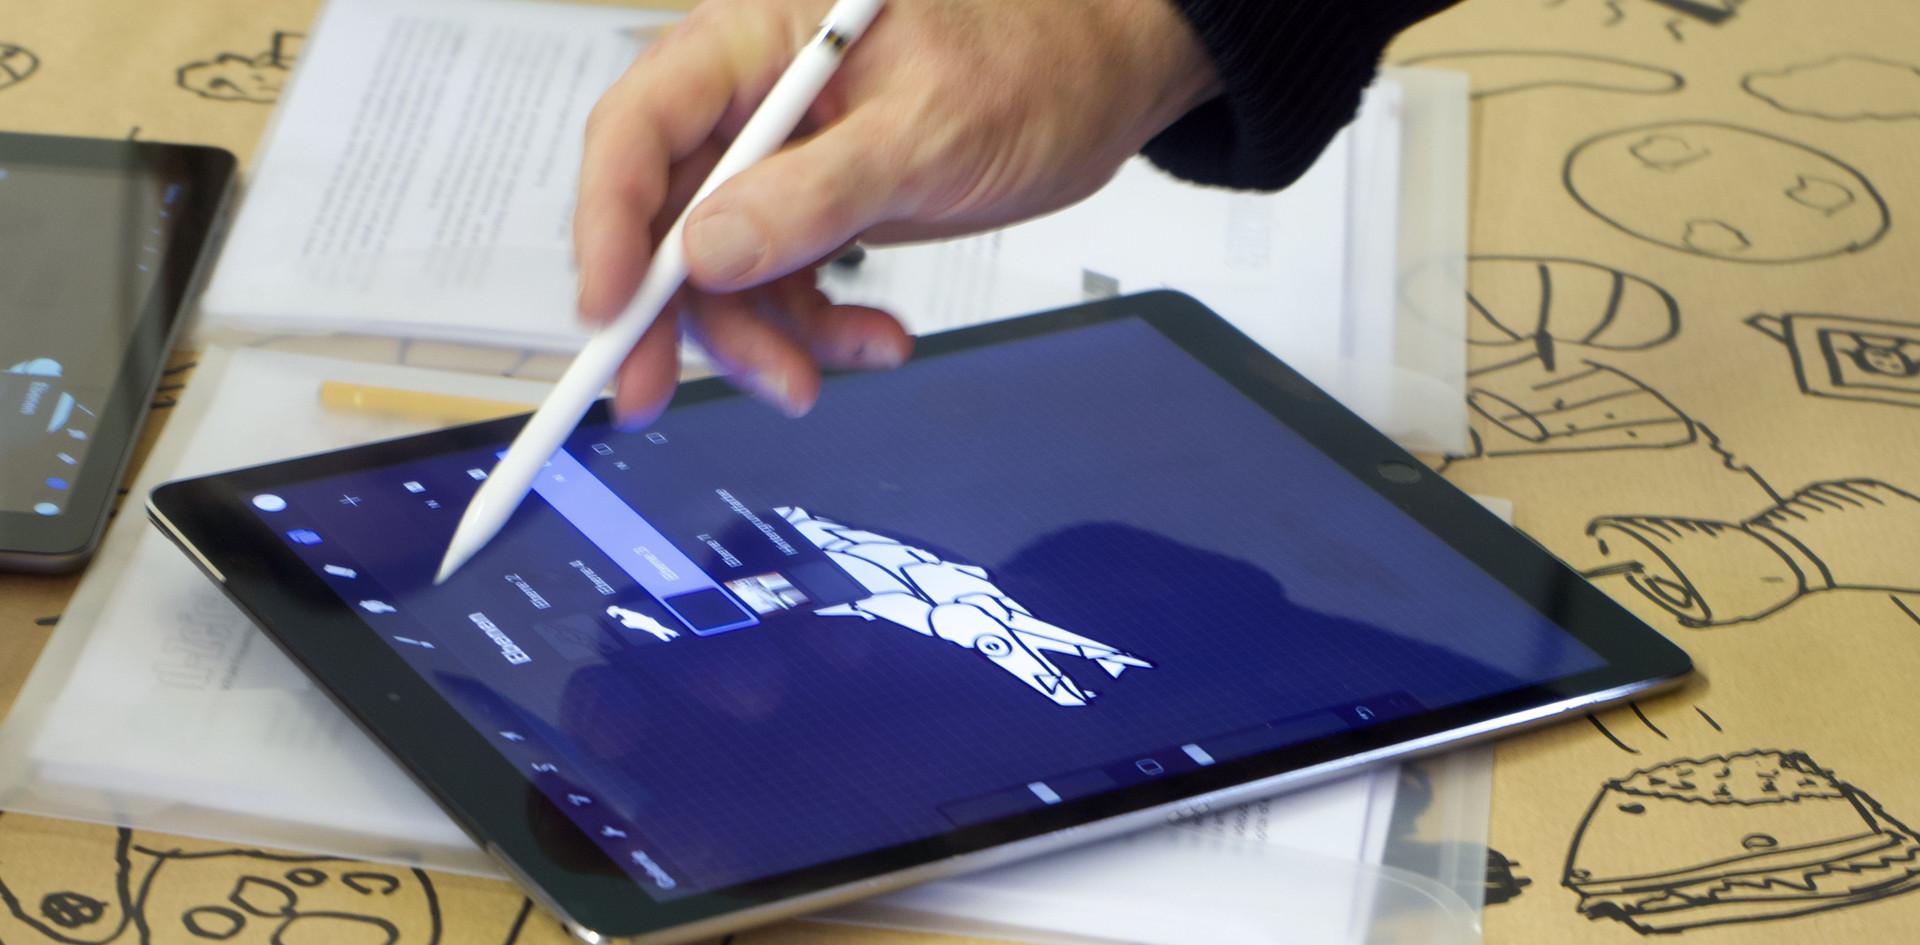 iPad-Kurs 2020